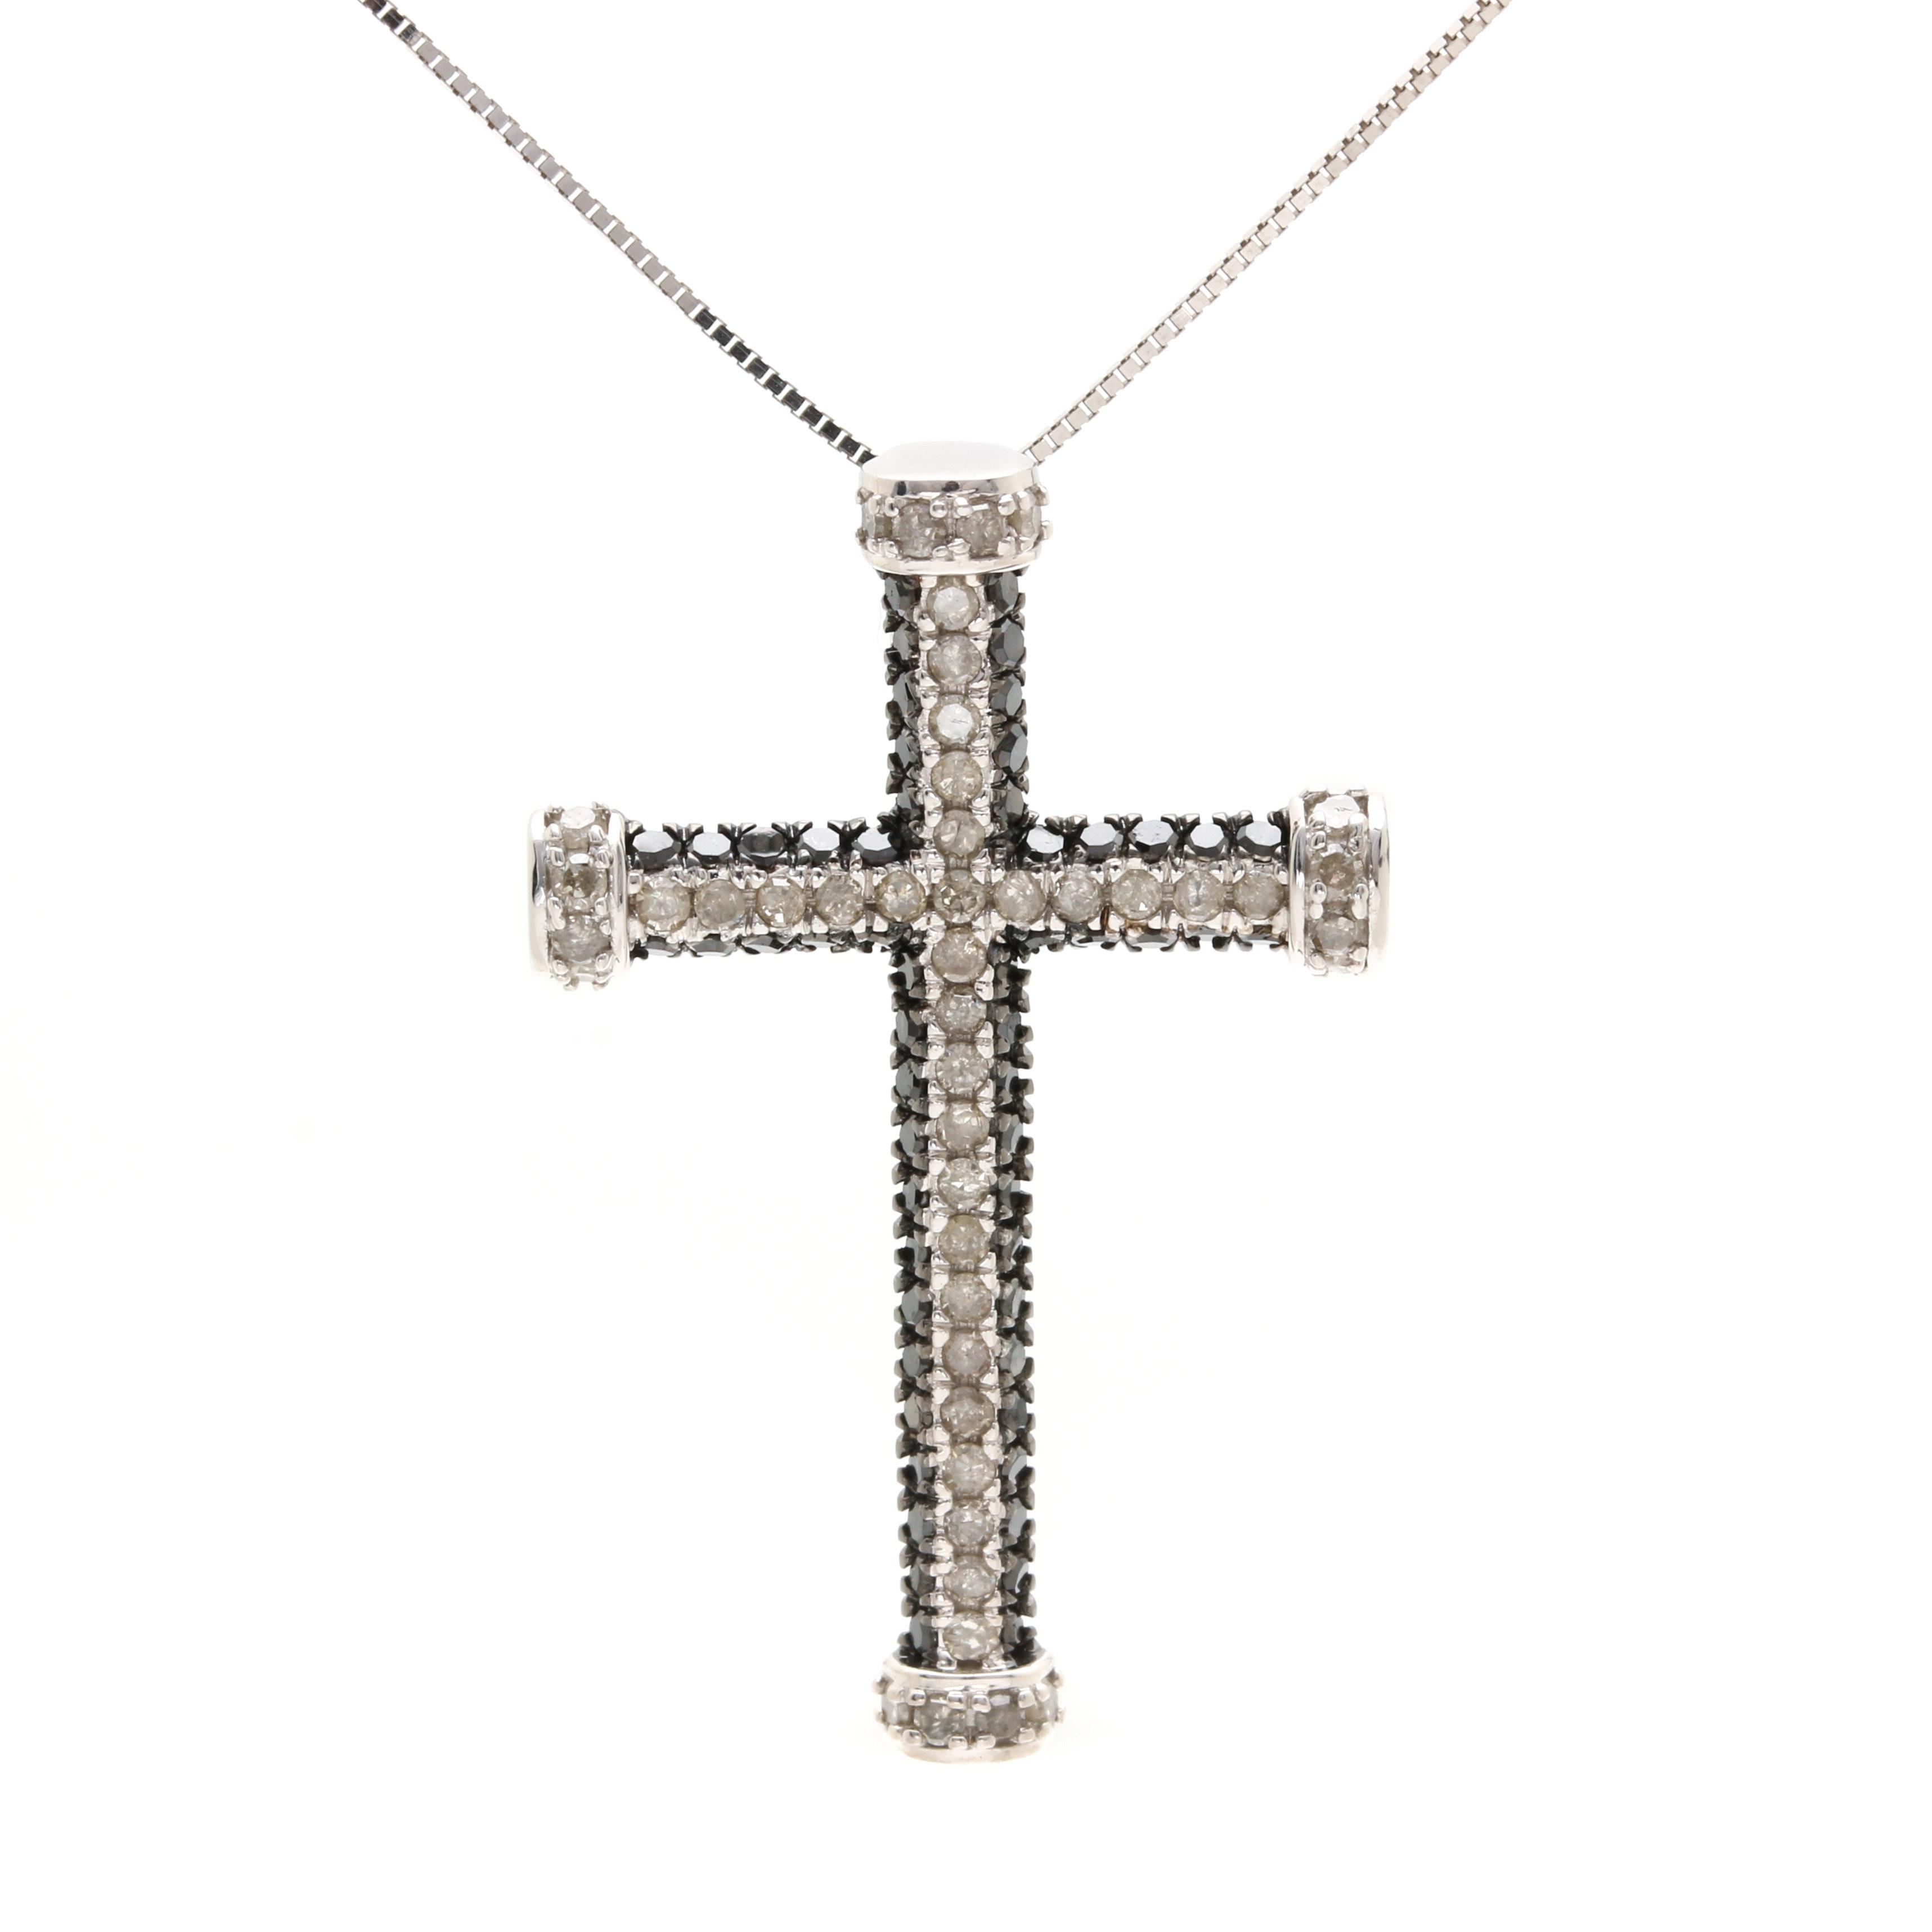 10K White Gold 1.01 CTW Diamond Cross Pendant Necklace